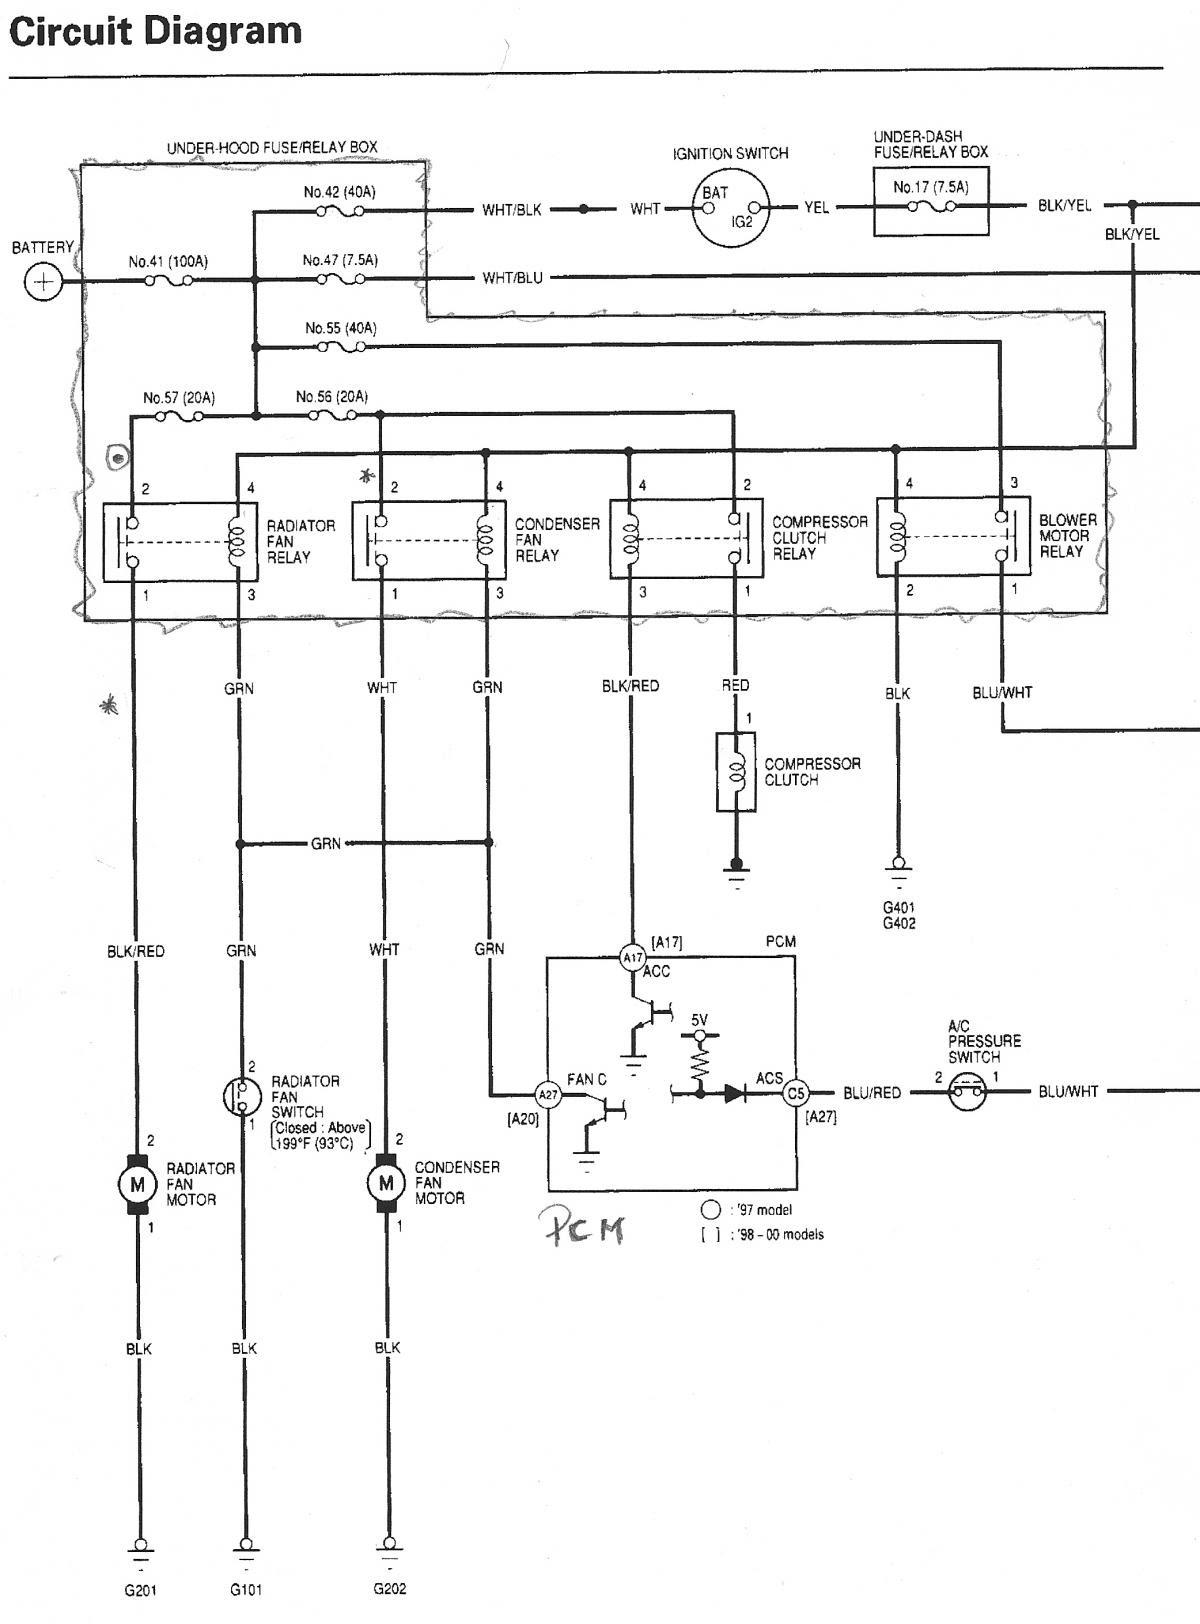 2006 Chevrolet Uplander Wiring Diagram